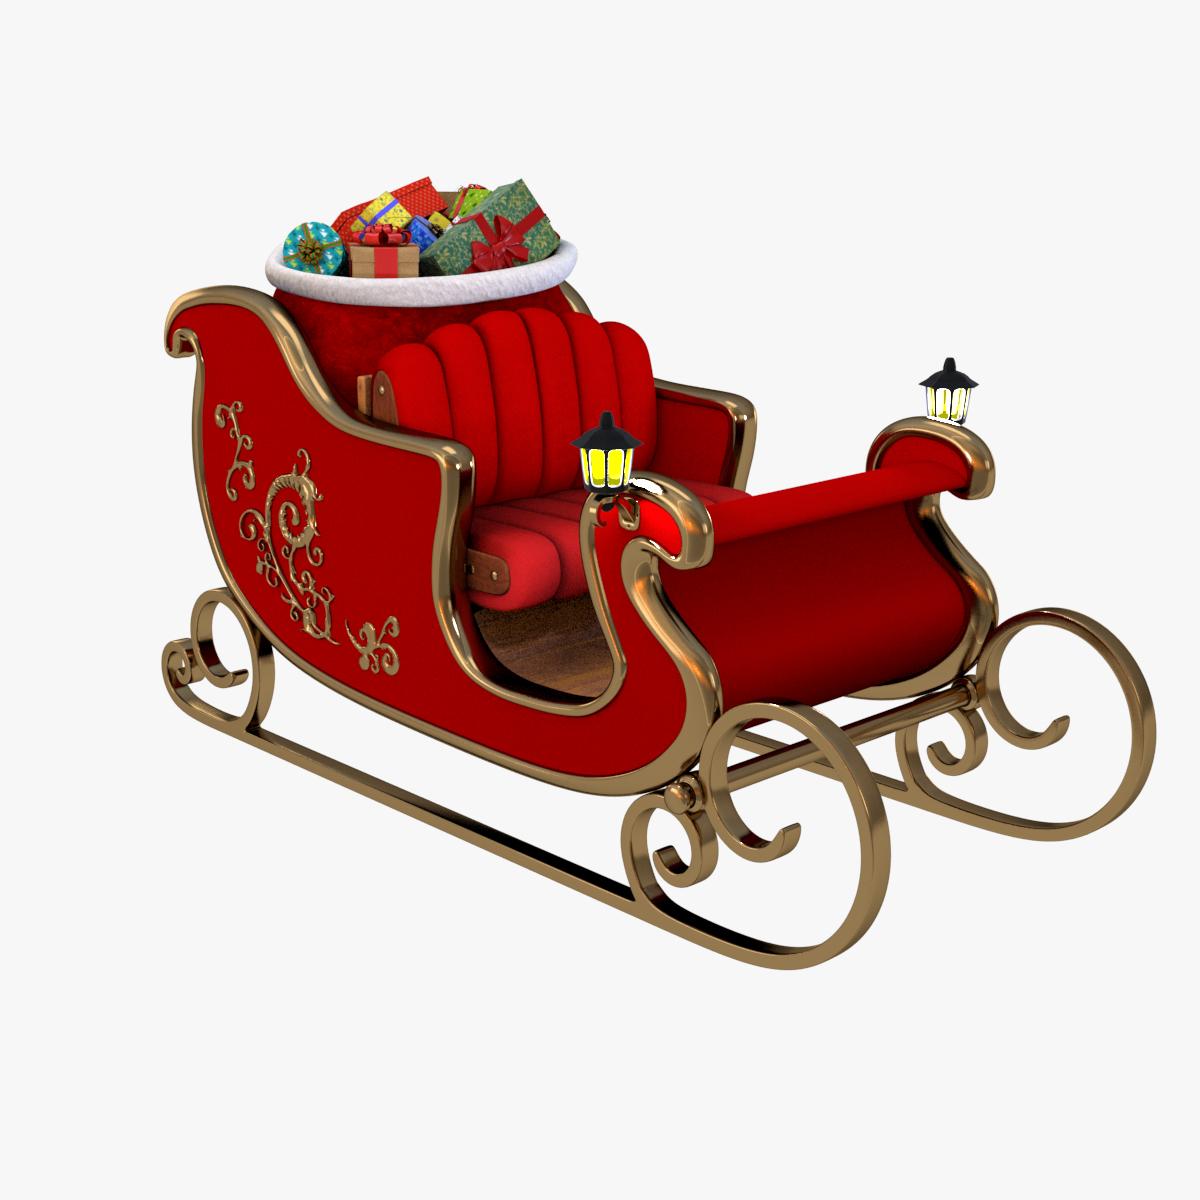 Image result for santa's sleigh